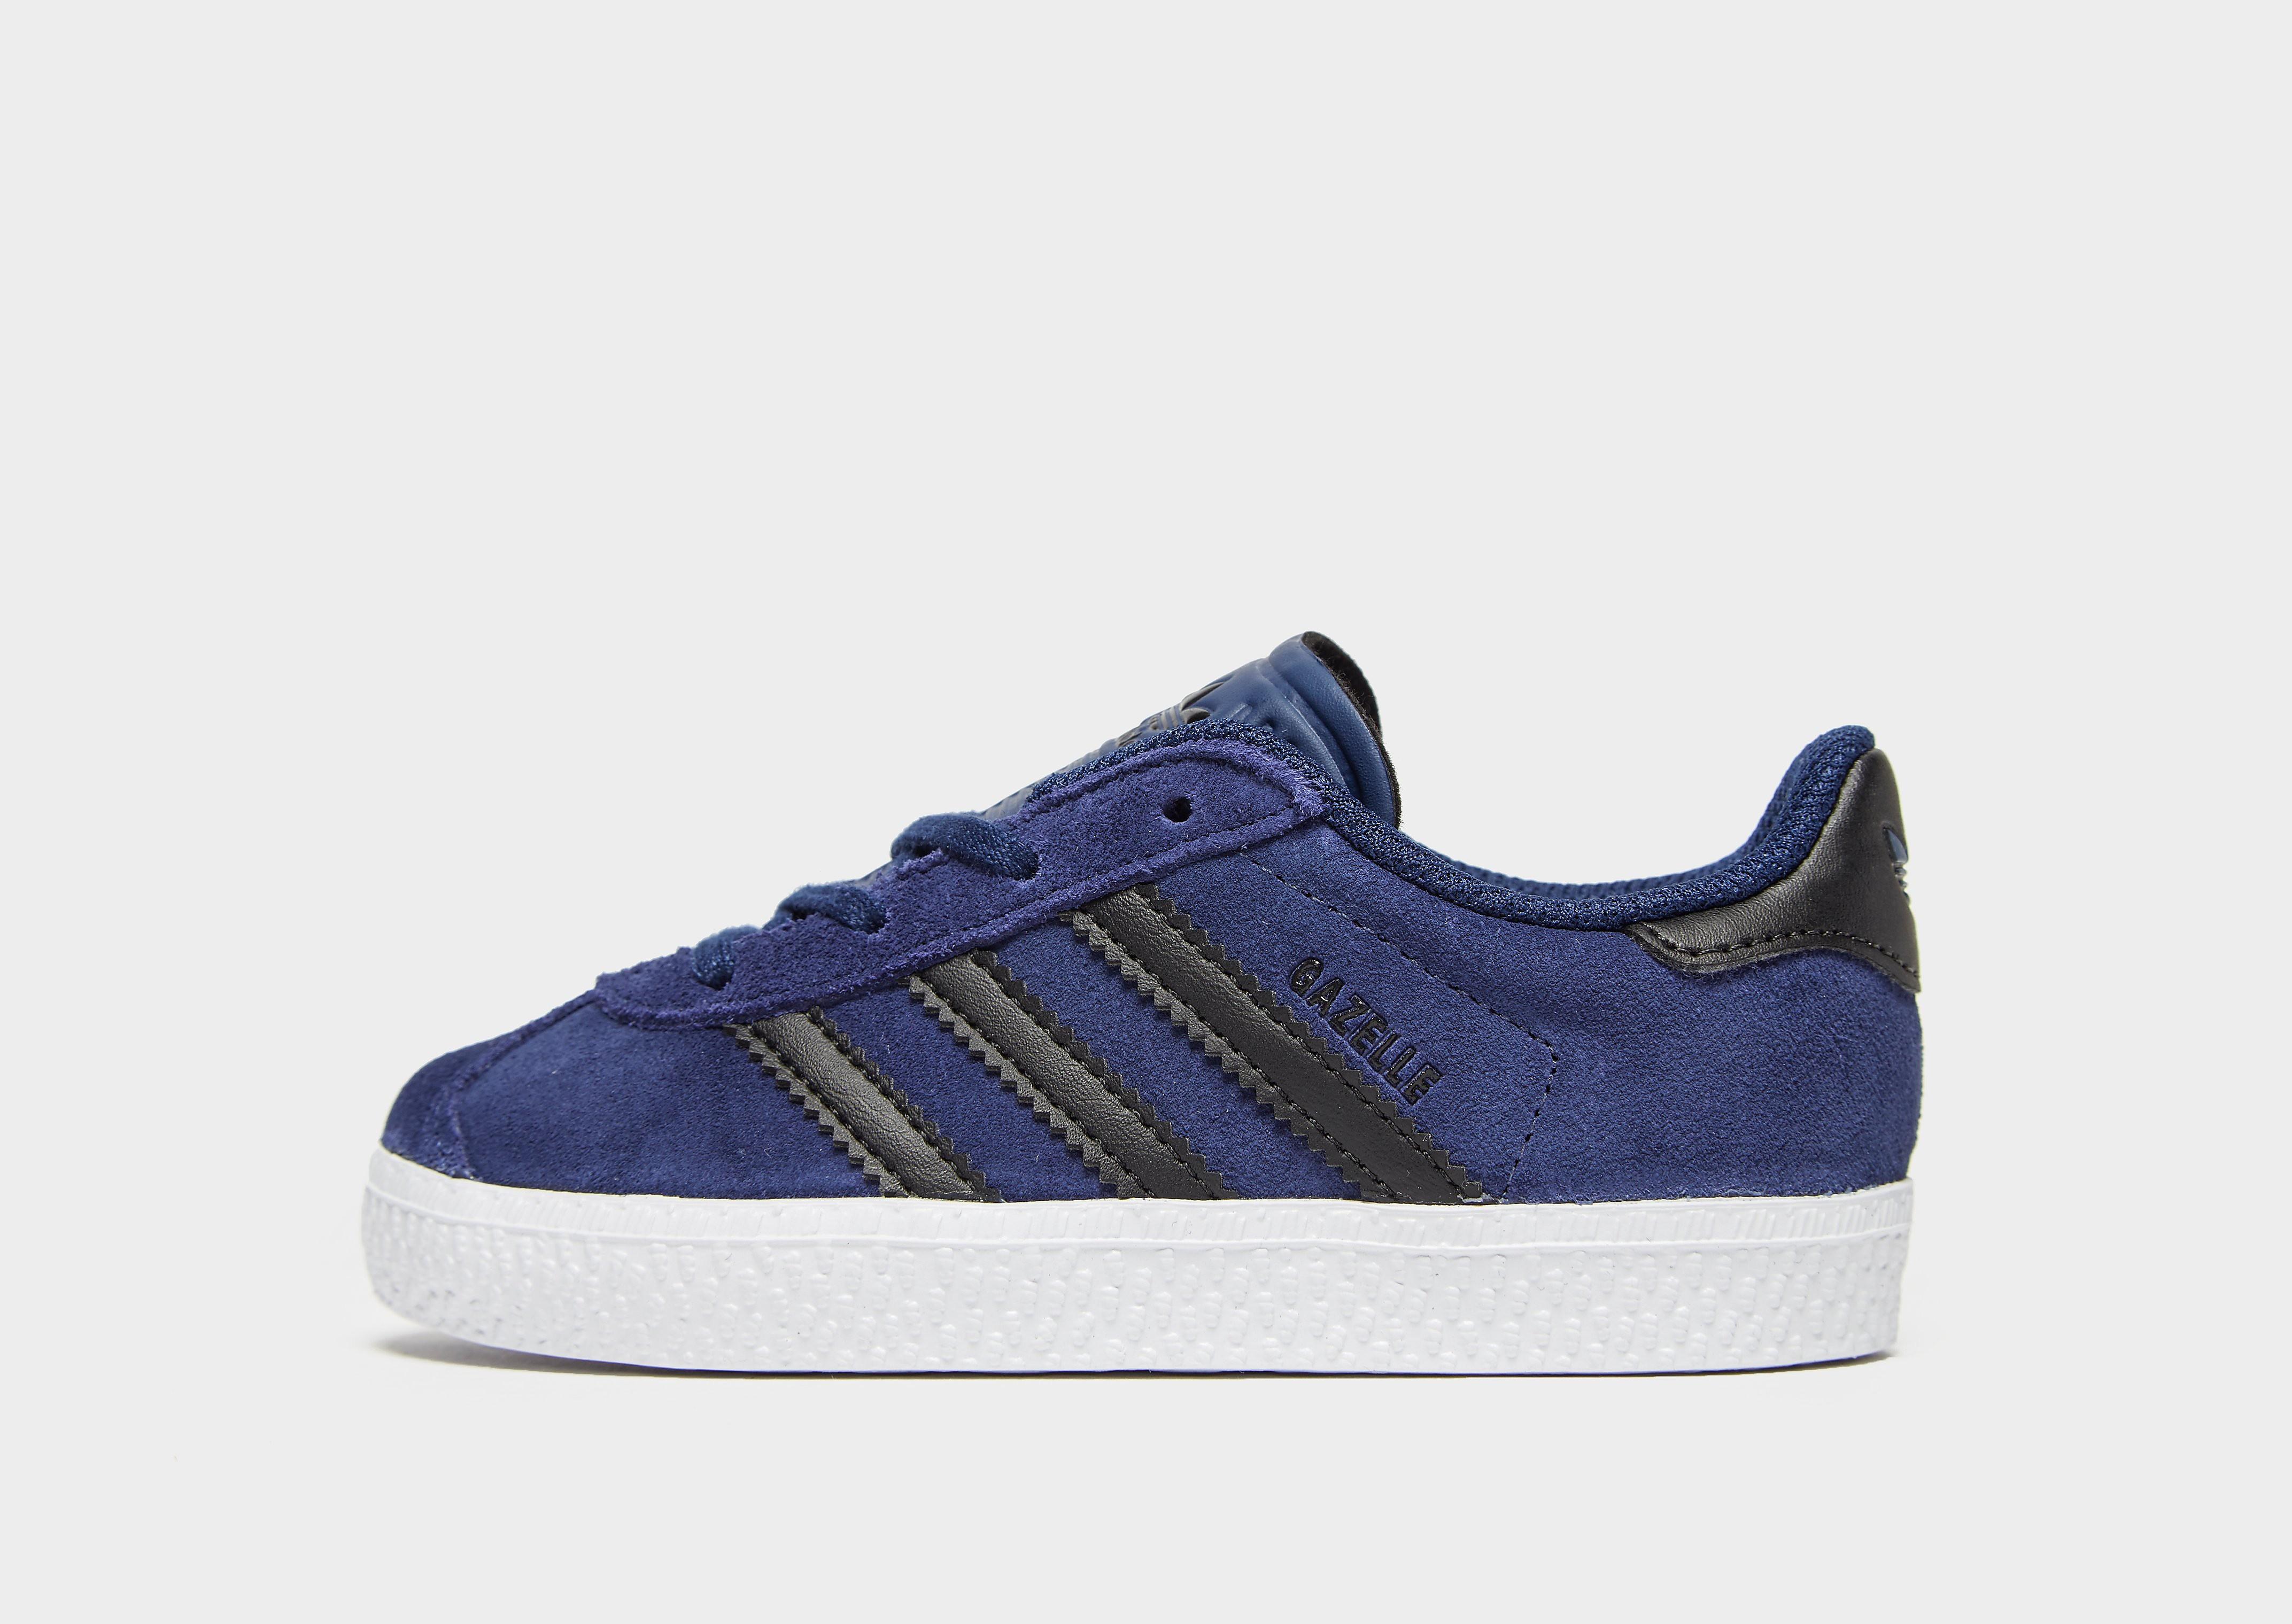 Adidas Gazelle kindersneaker blauw en zwart